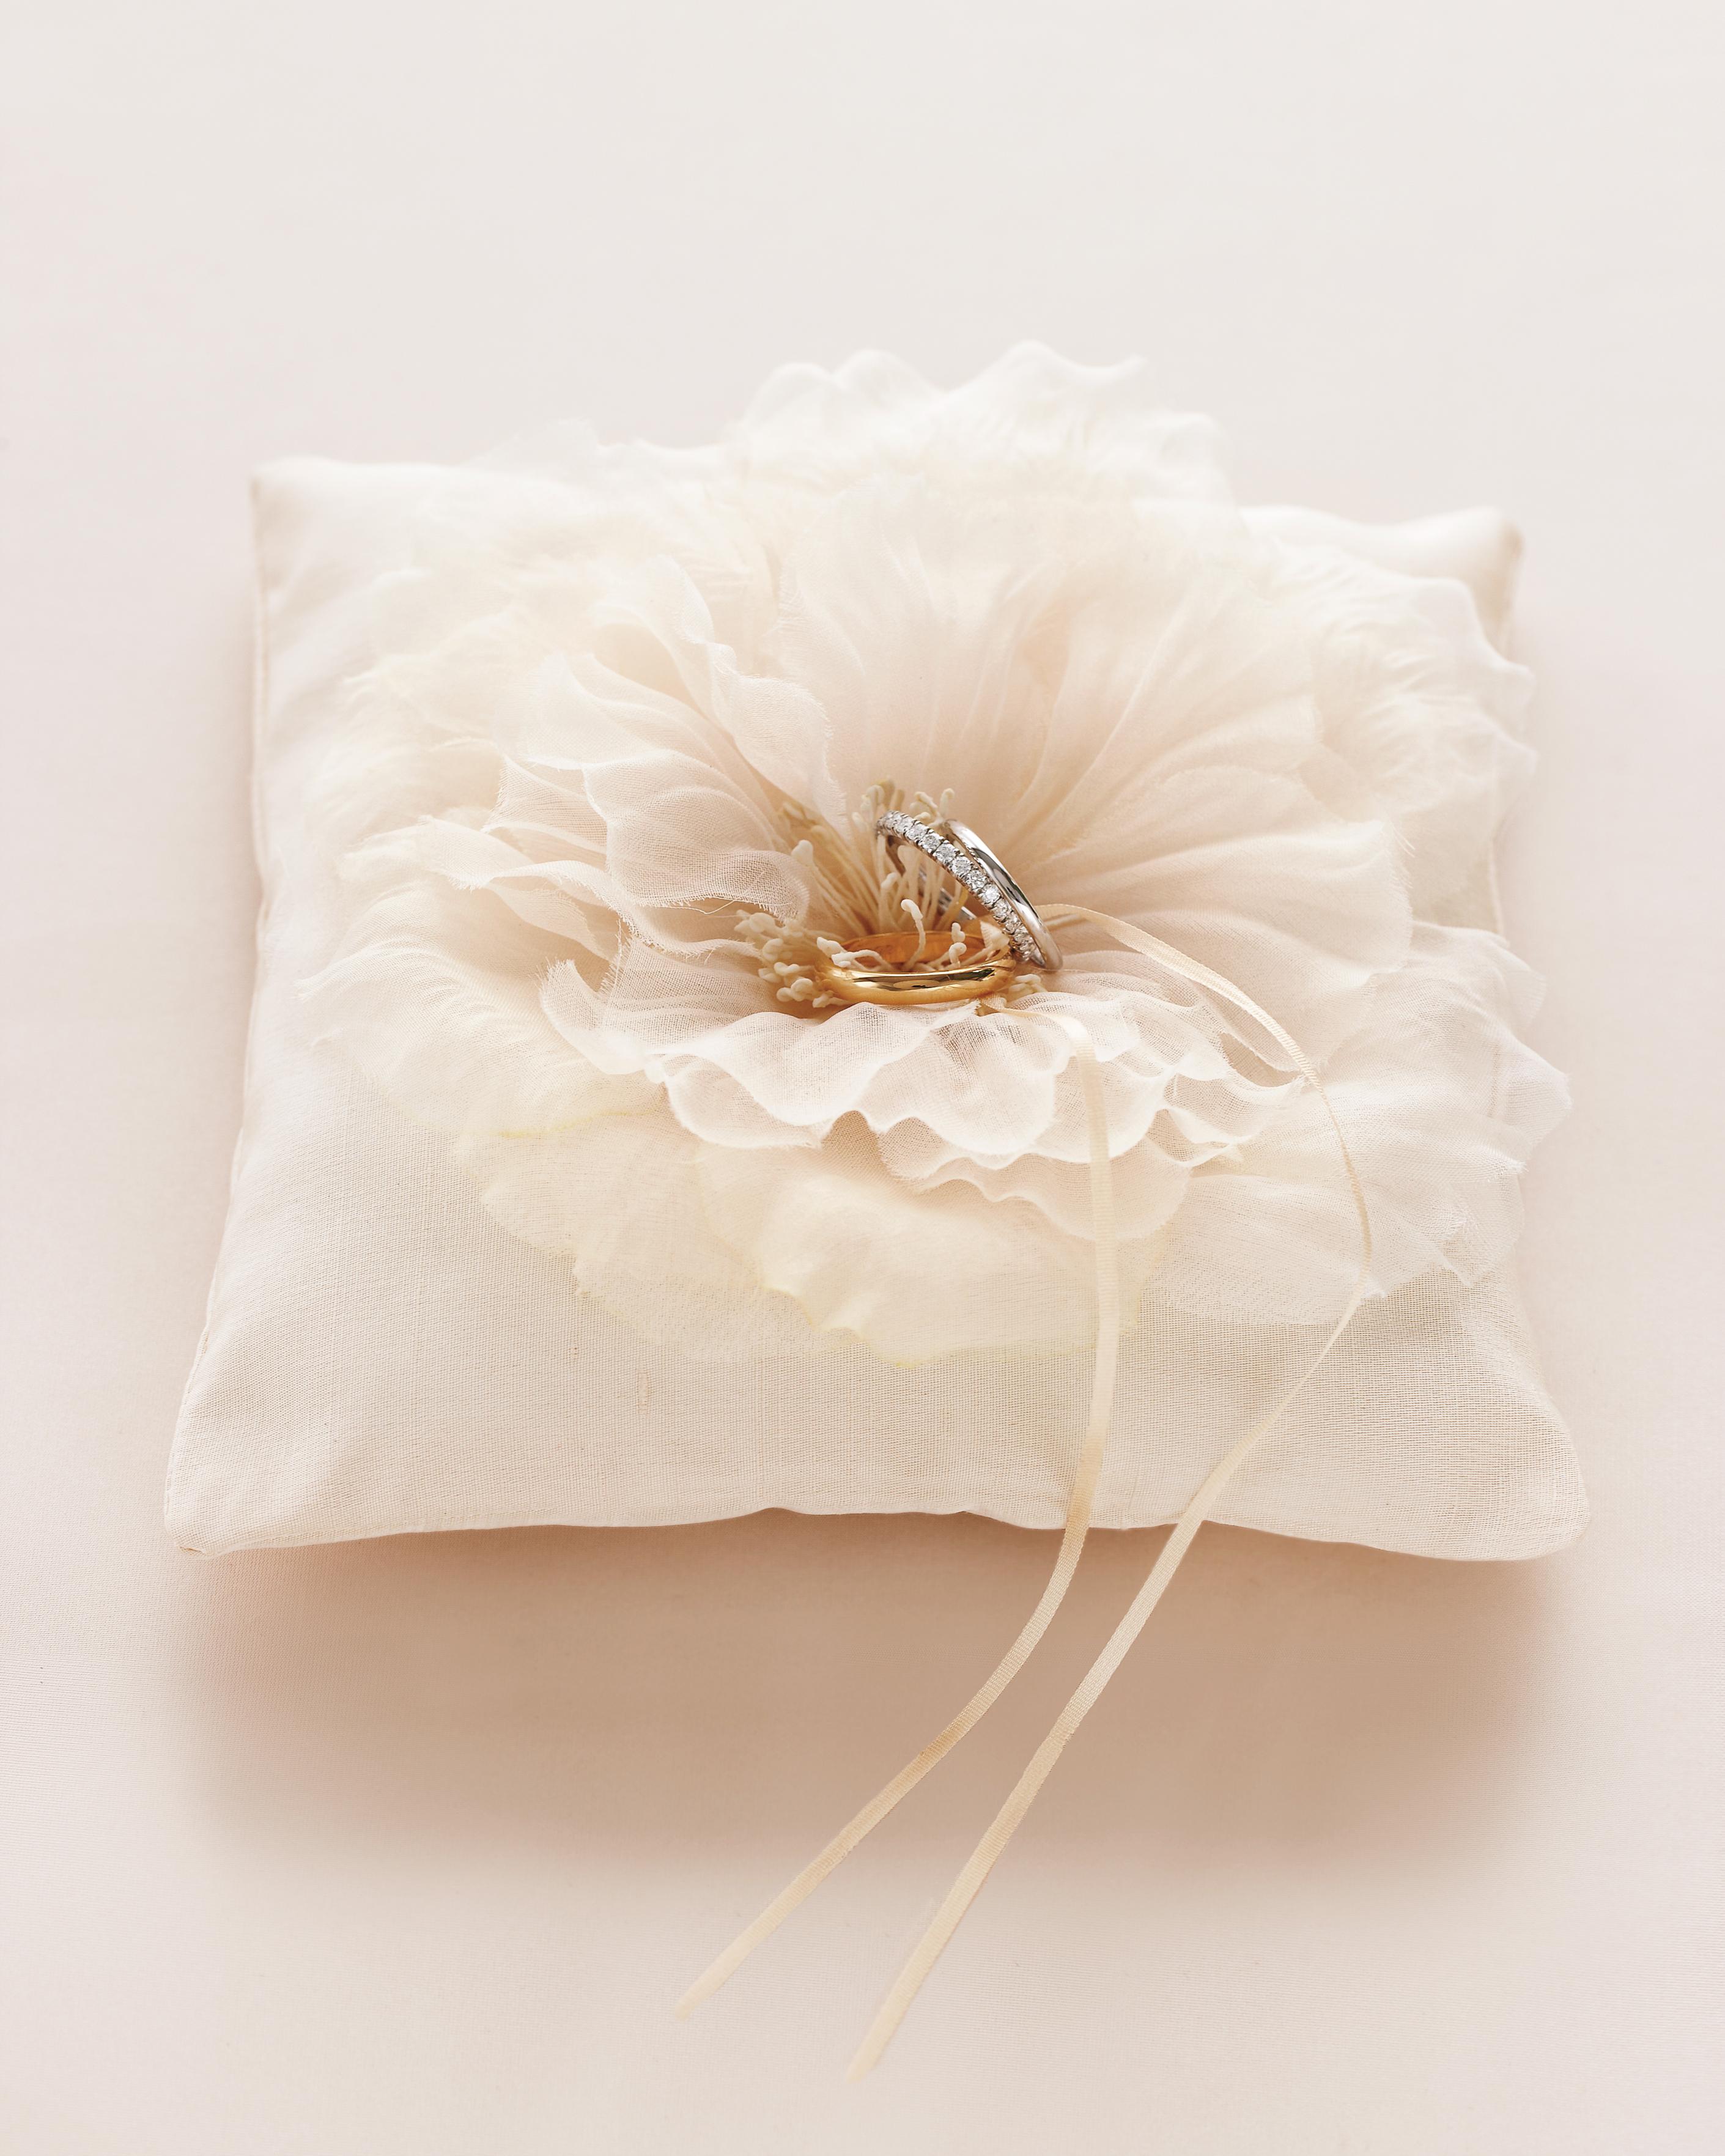 katie-james-ring-pillow-056-1-mwd108944.jpg